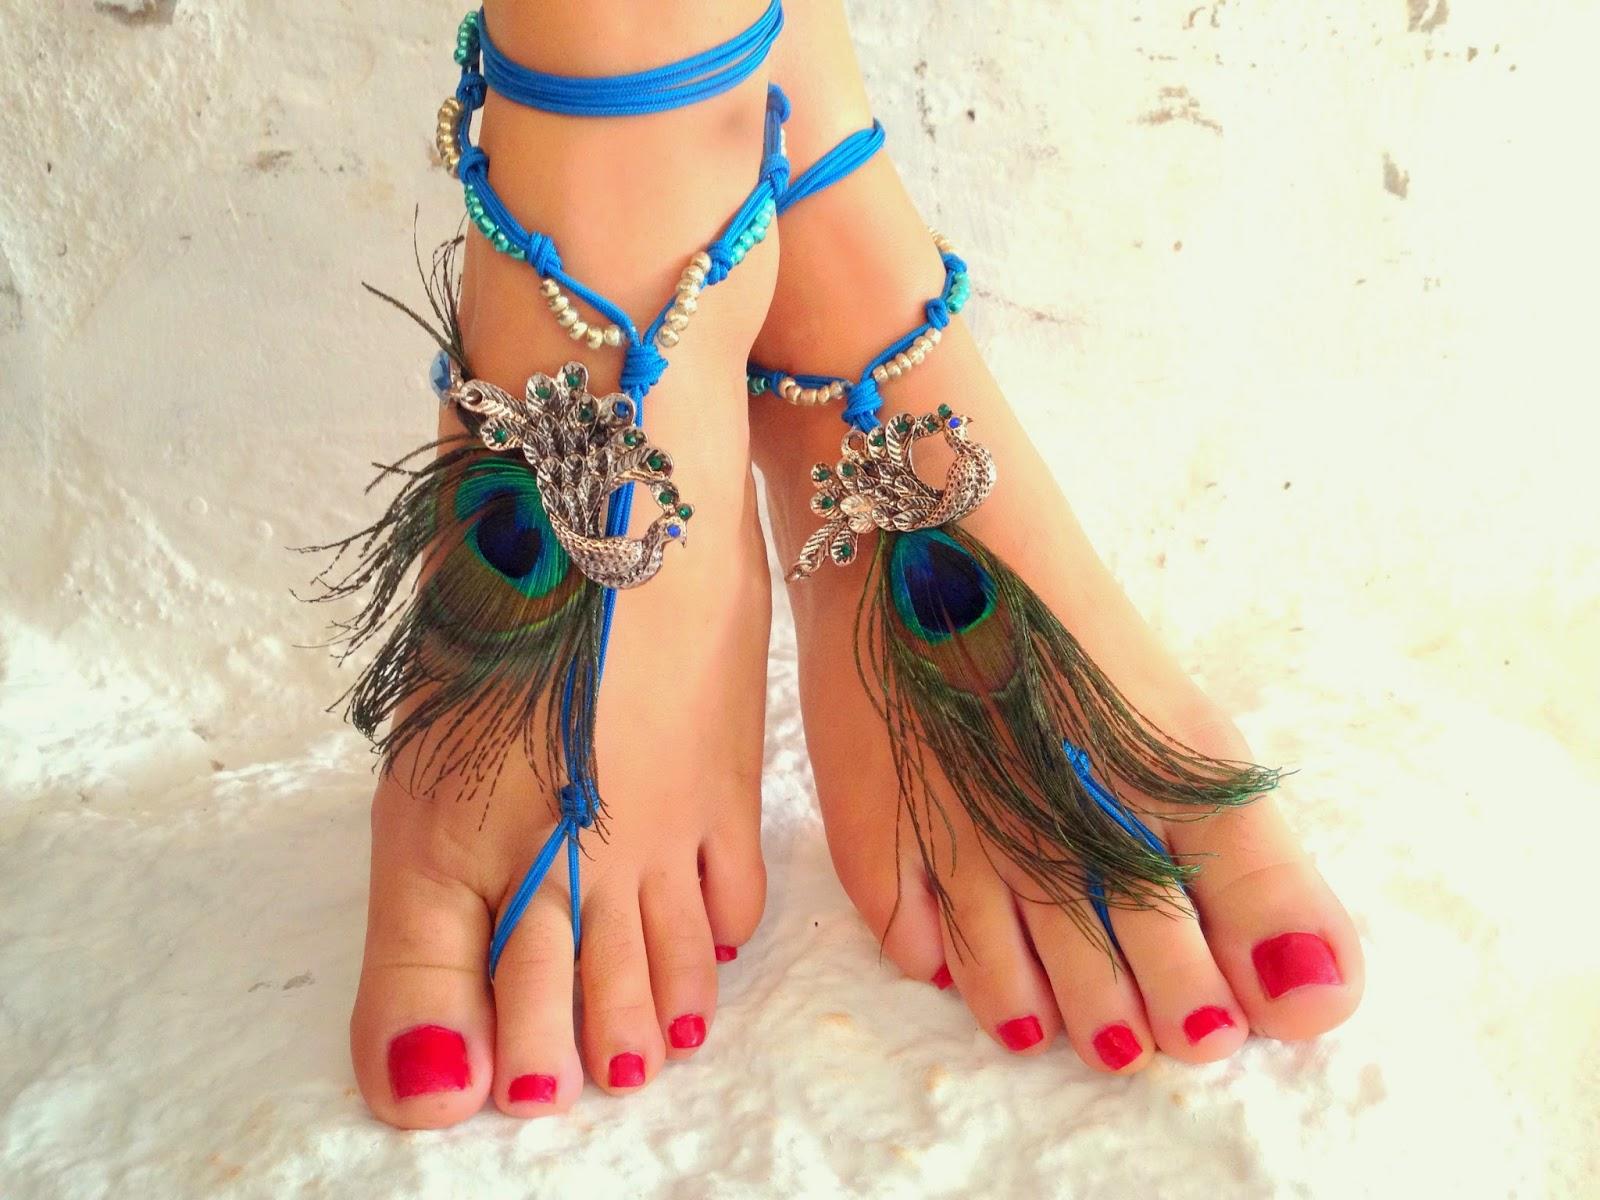 b4cf90029acd Barefoot sandals. beach sandal